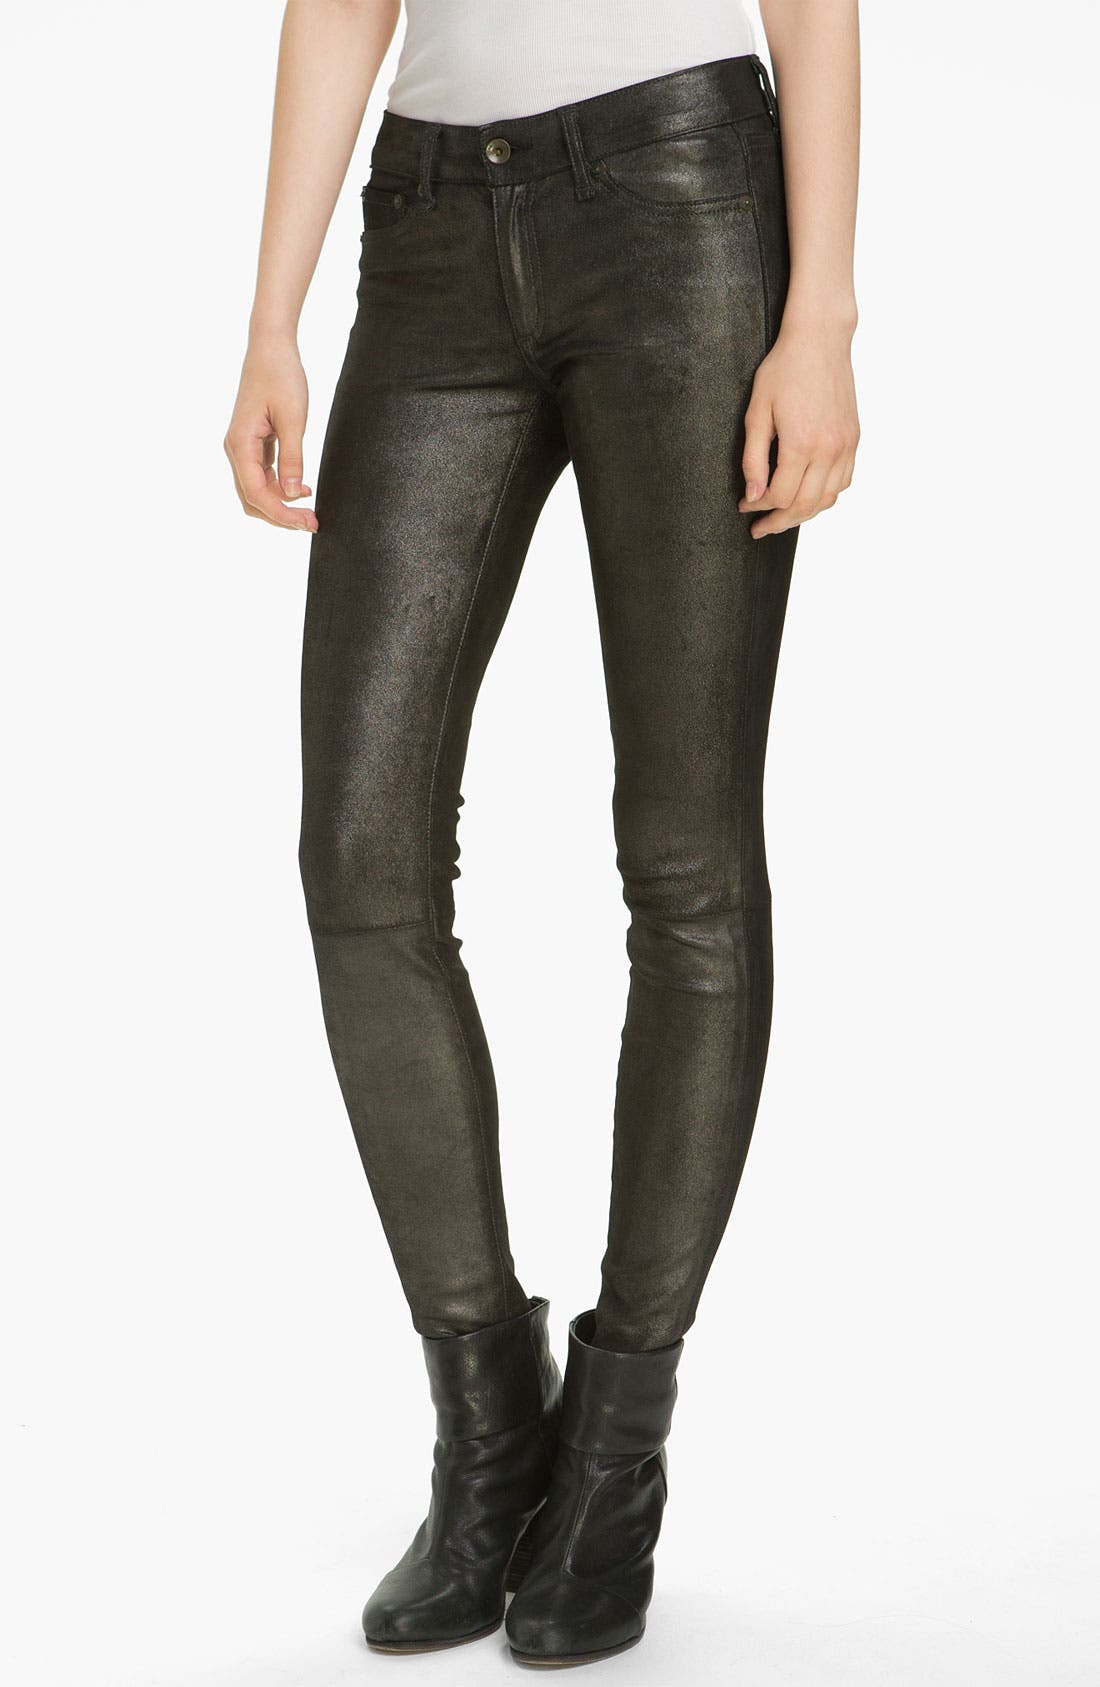 Alternate Image 1 Selected - rag & bone/JEAN Stretch Leather Leggings